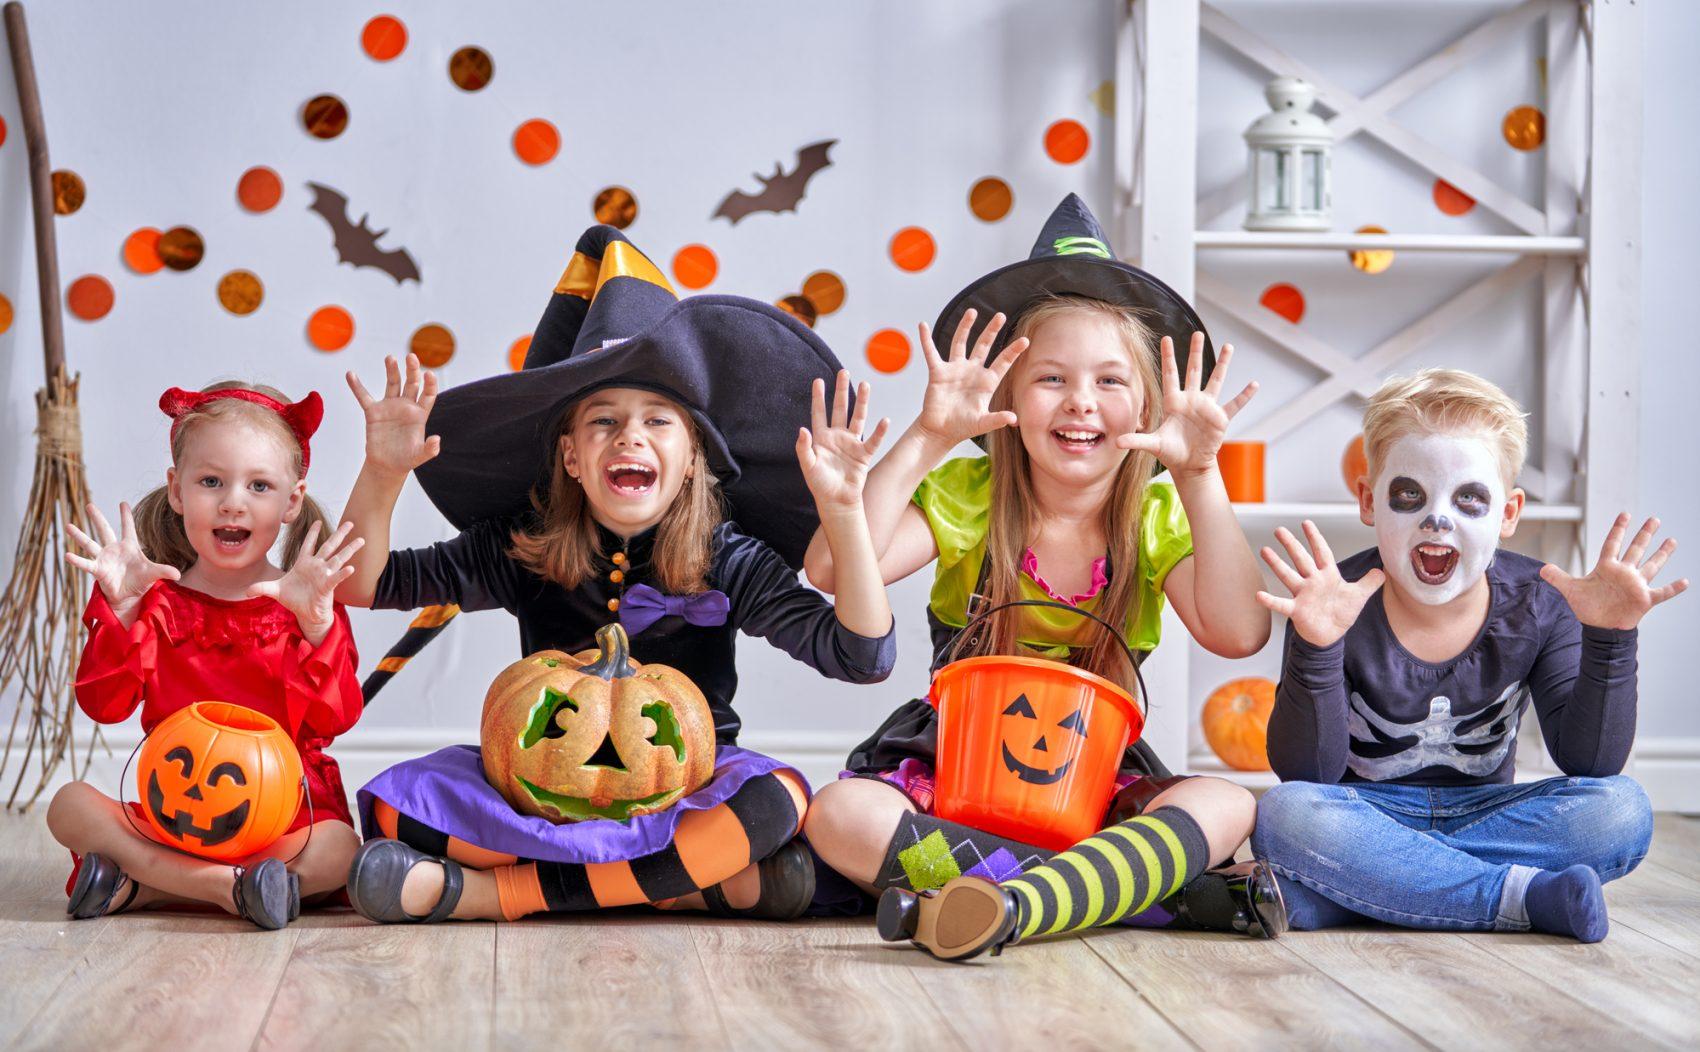 Ricerca Halloween In Inglese.Filastrocche Di Halloween In Italiano E In Inglese